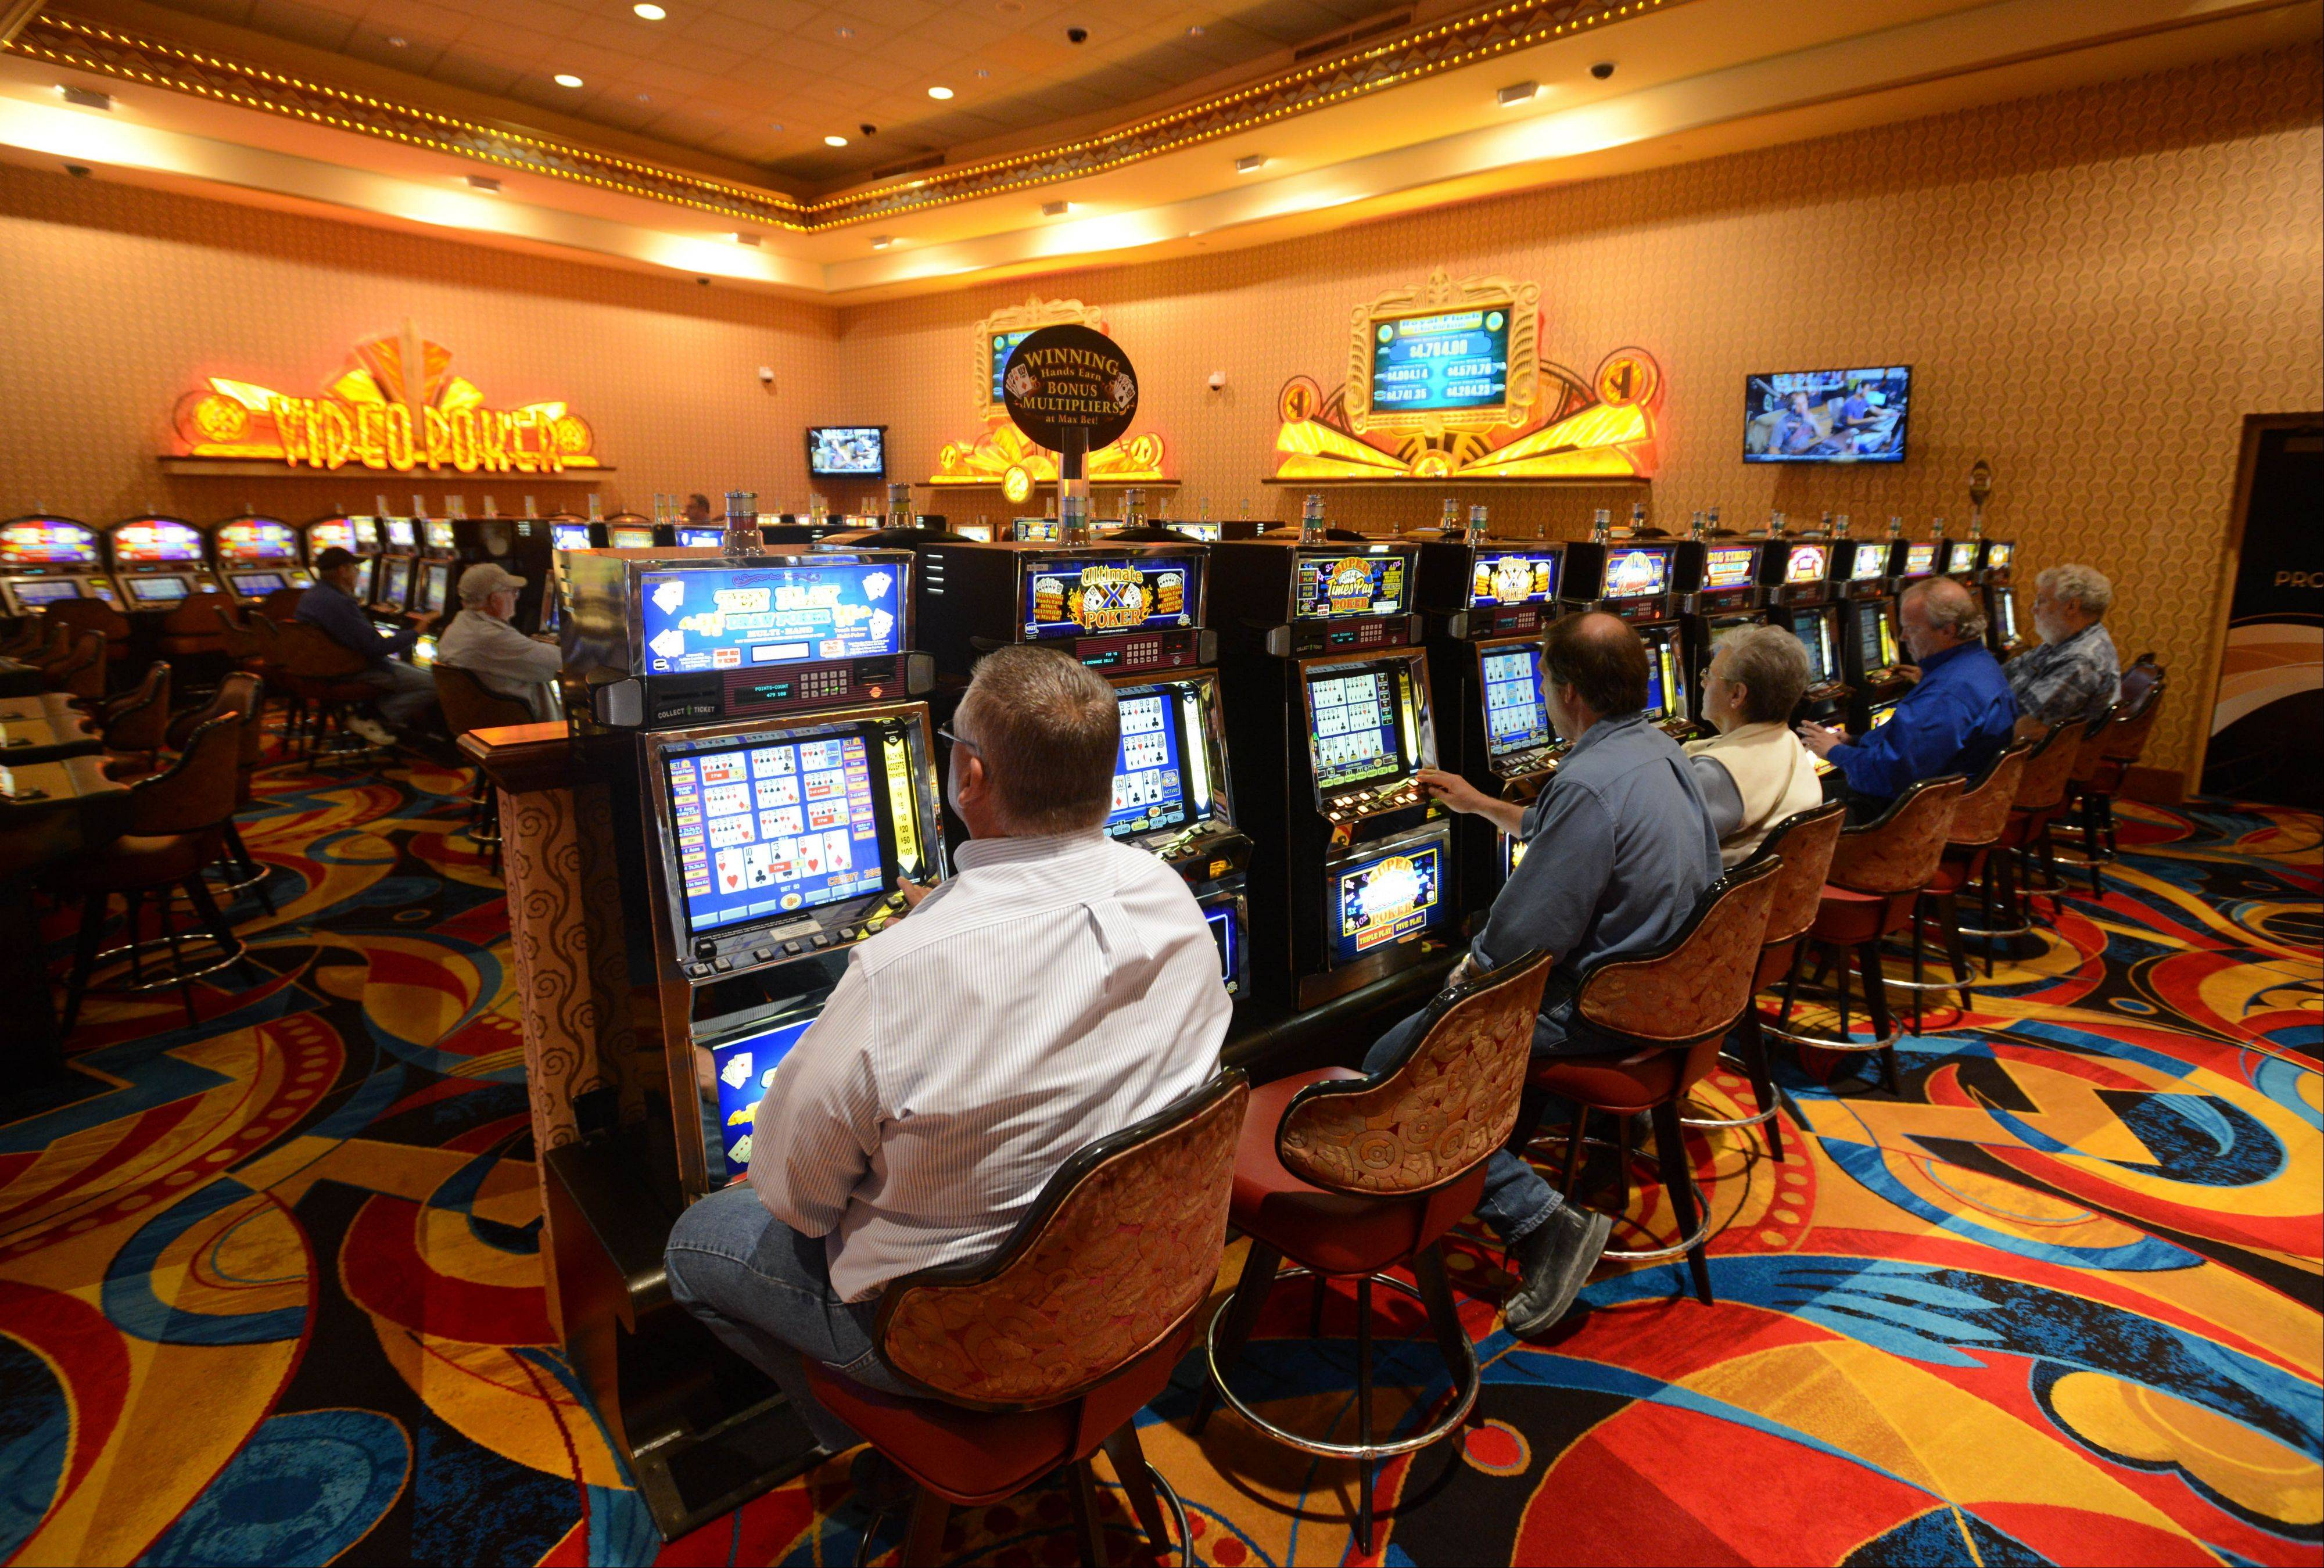 Hollywood casino auroa ill flamingo hotel casino las vegas